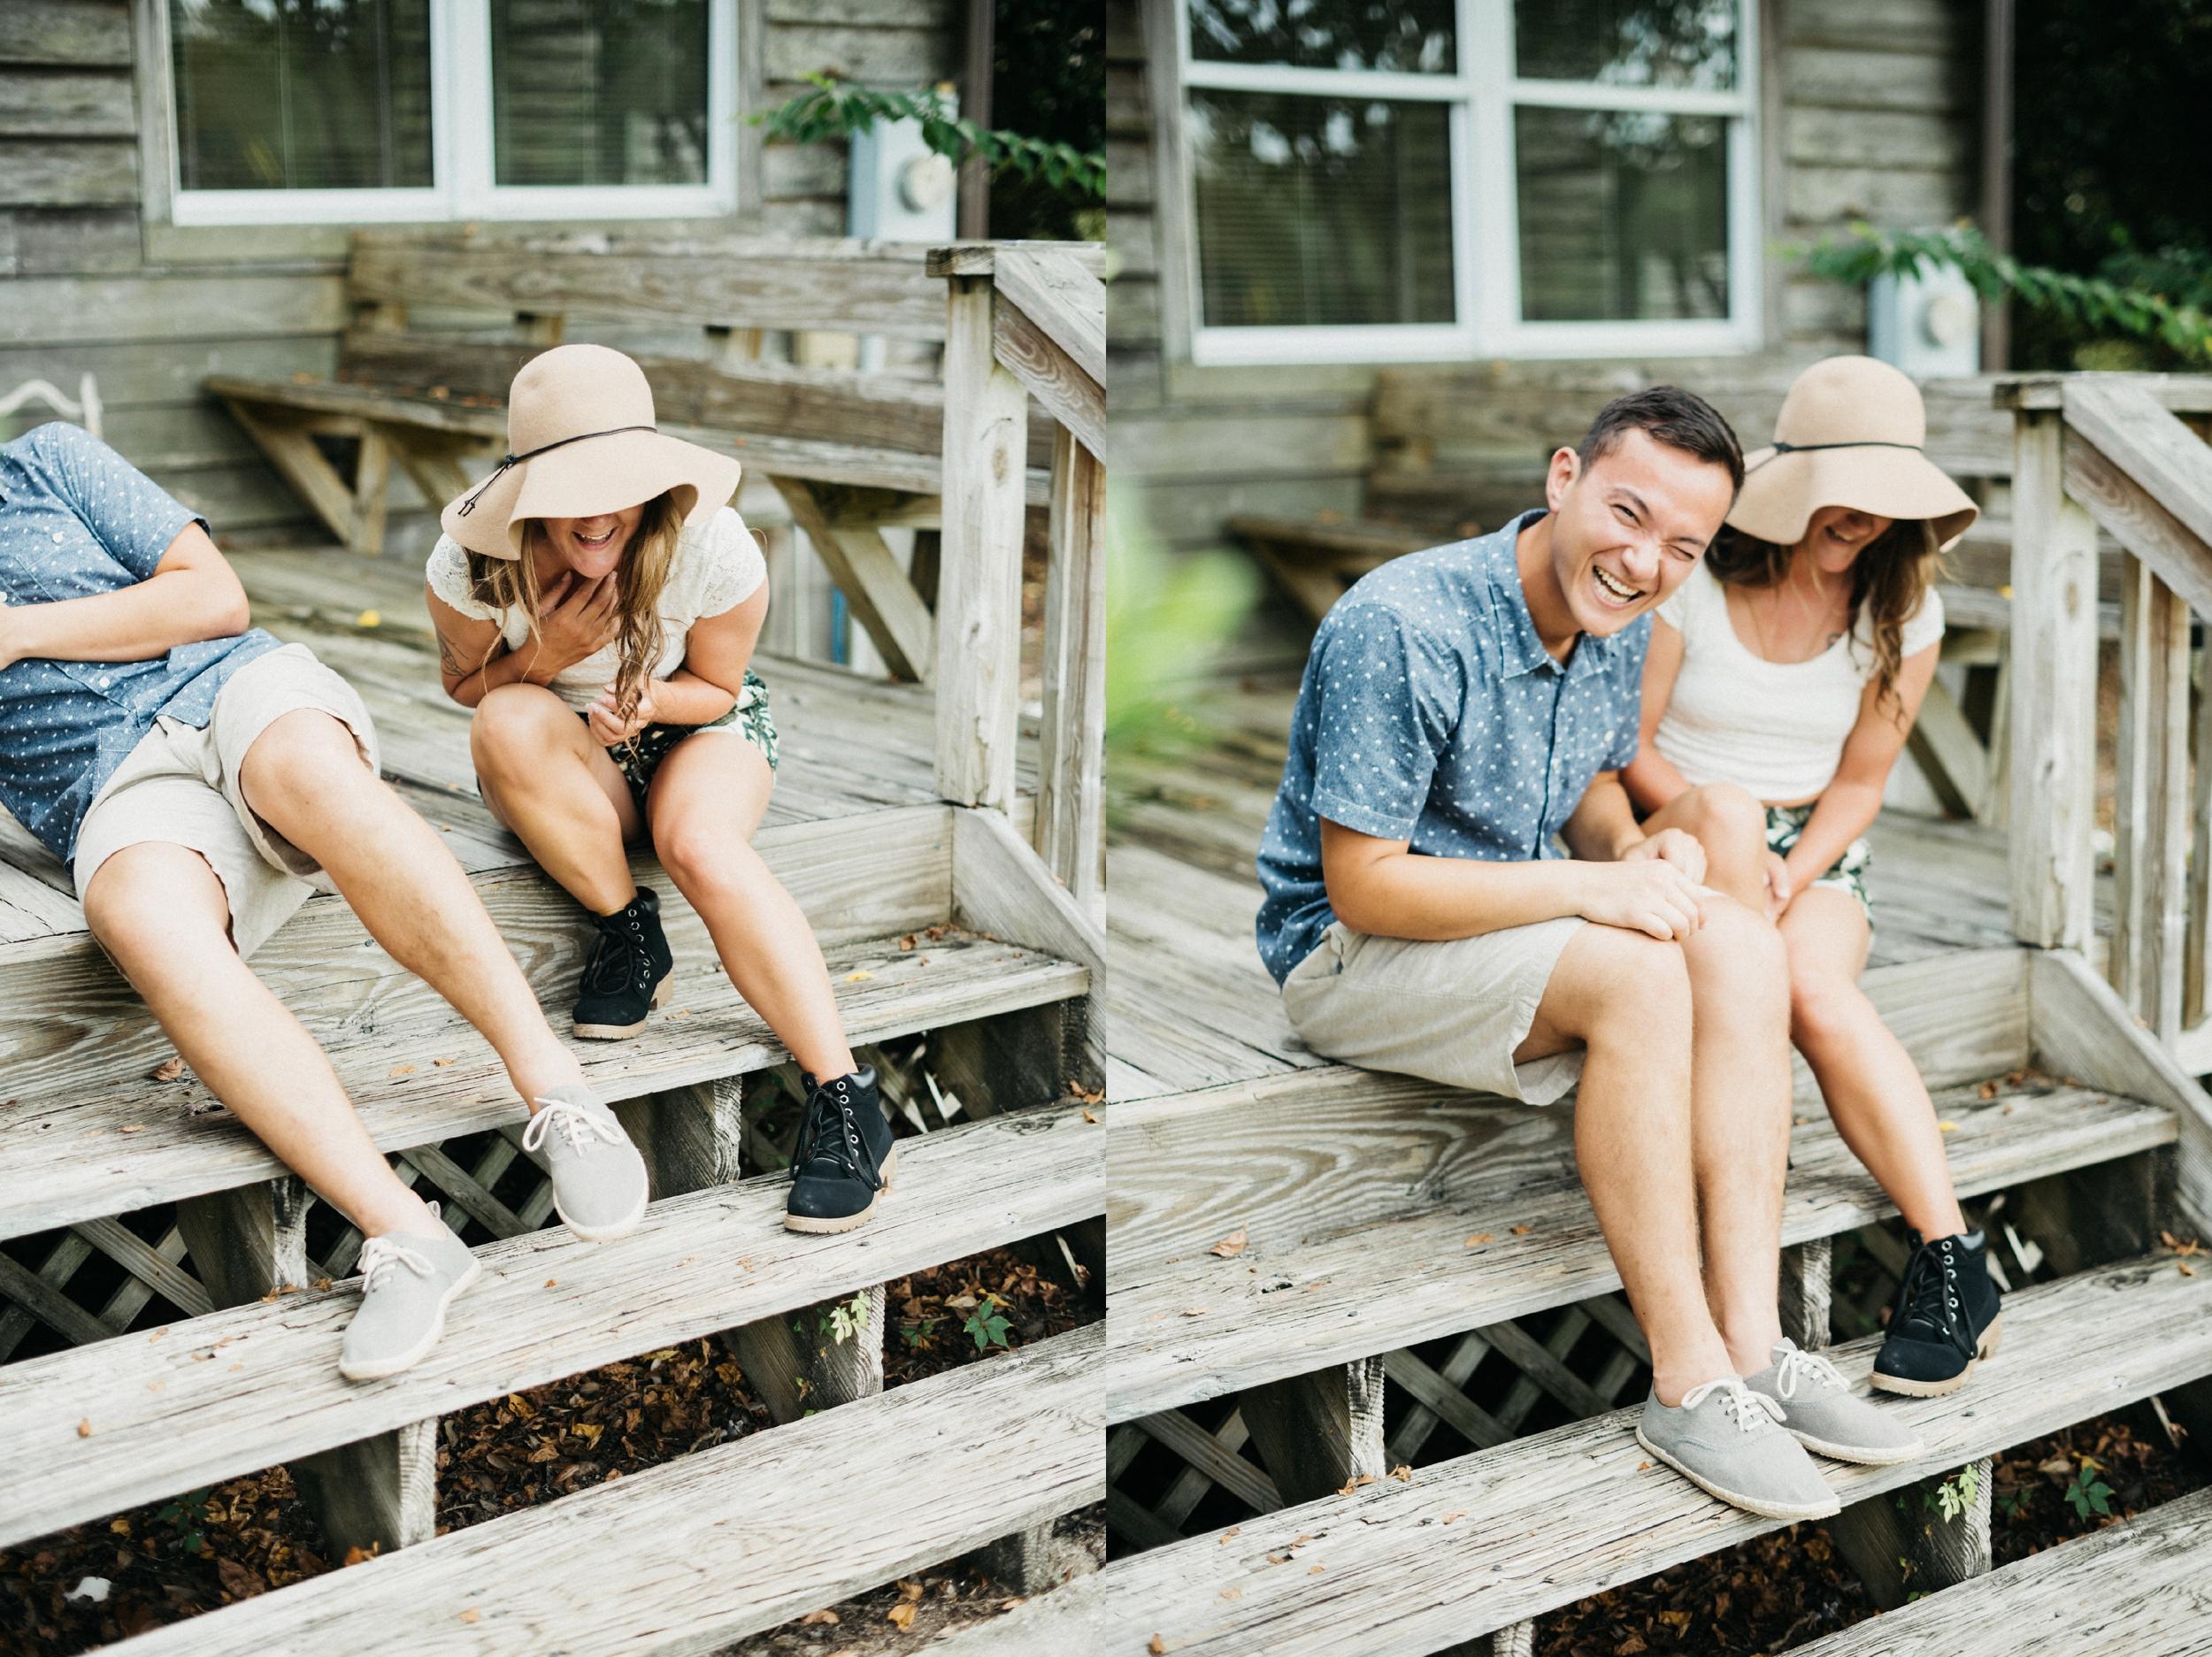 desiree-gardner-photography-pairs-france-monet-garden-monets-couple-wedding-engagement-giverny-30-a-30a-florida_0041.jpg